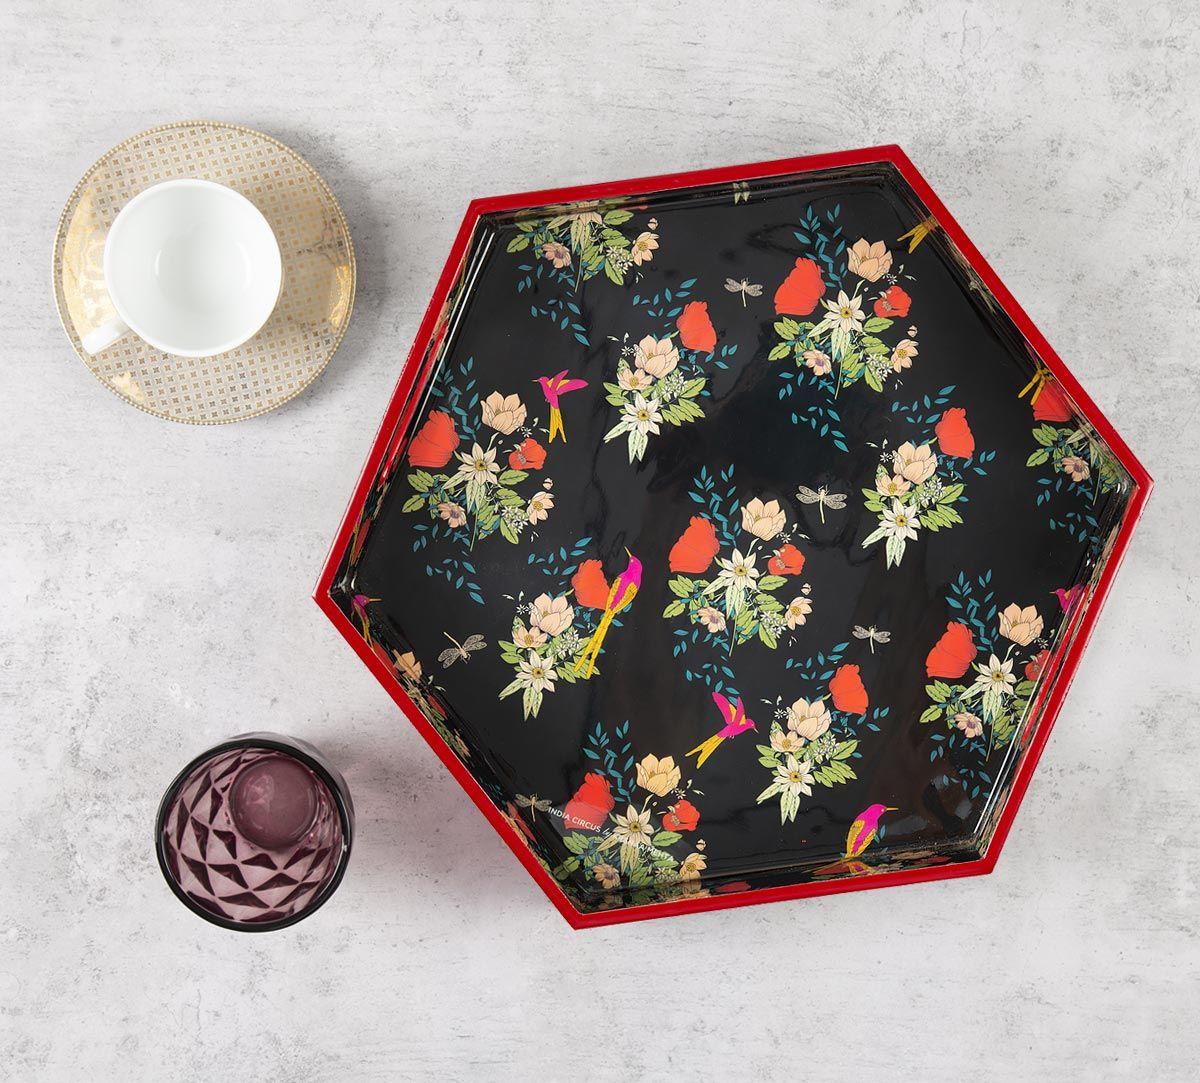 India Circus Floral Fascination Hexagon Serving Tray